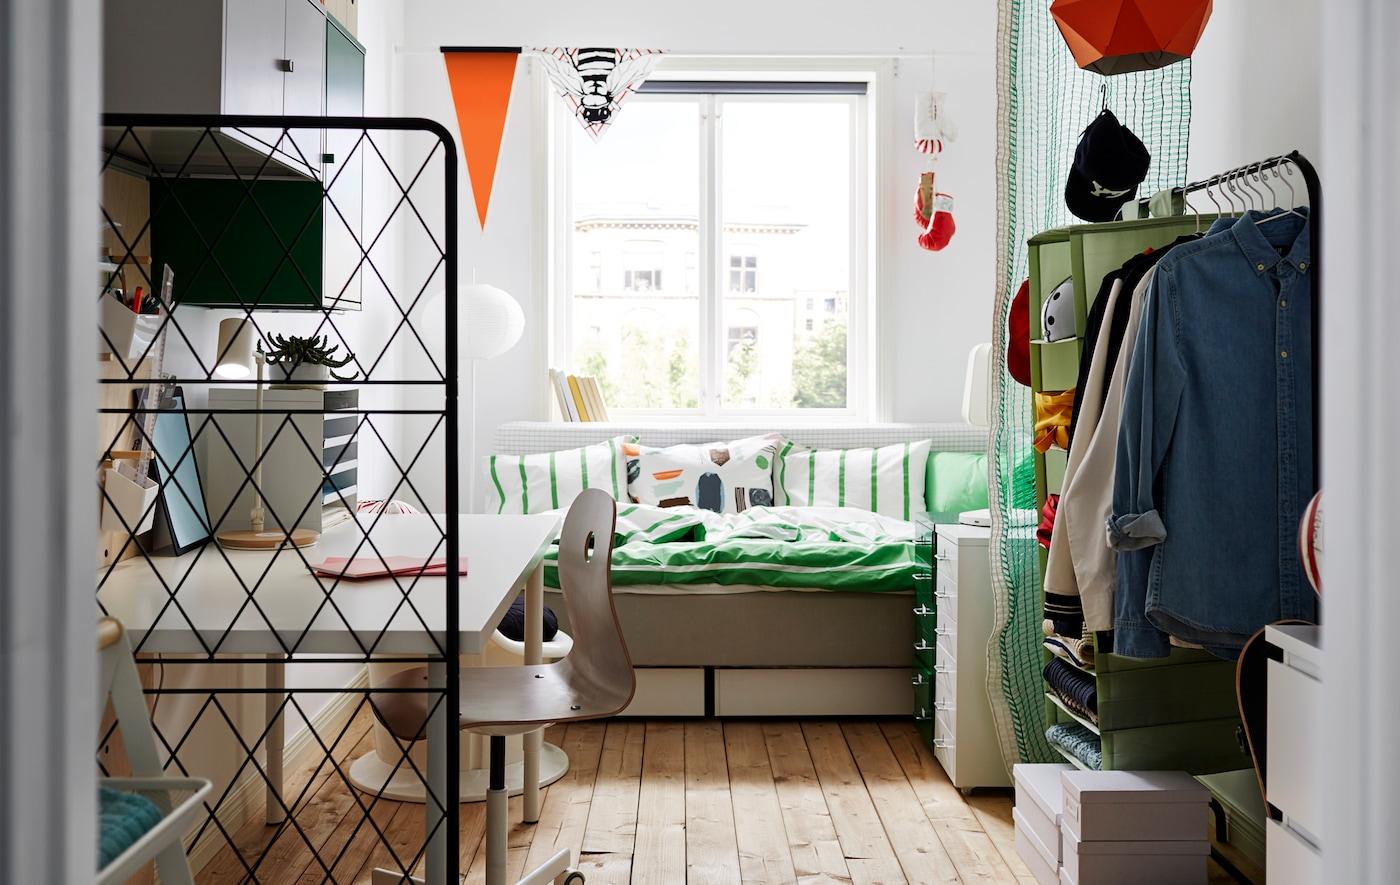 Dorm room by Emma Parkinson for IKEA